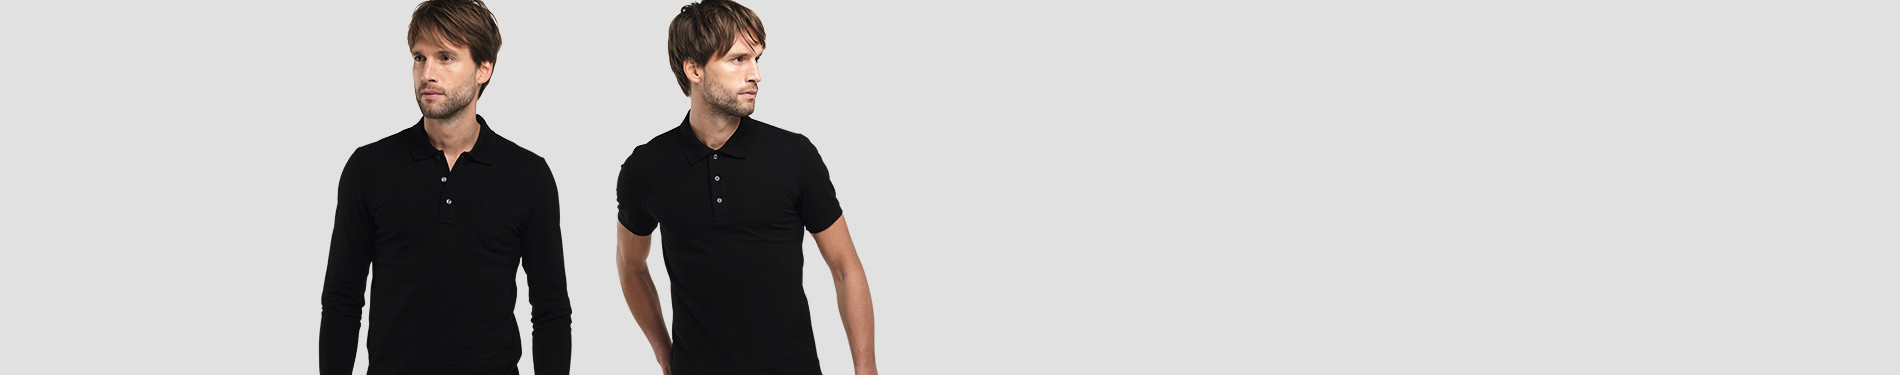 Black Poloshirts